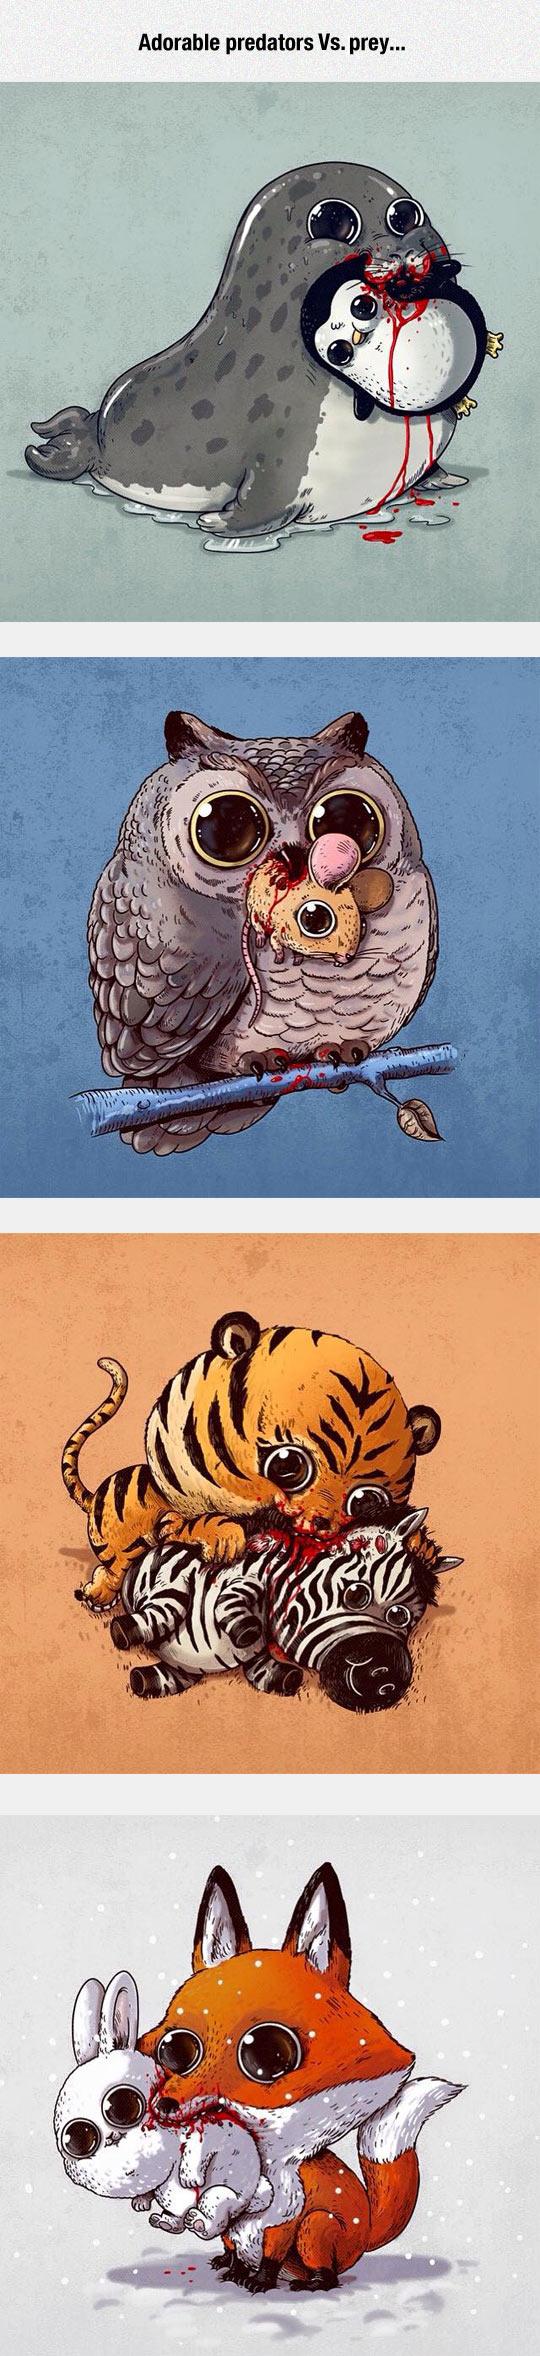 funny-adorable-predator-prey-illustration